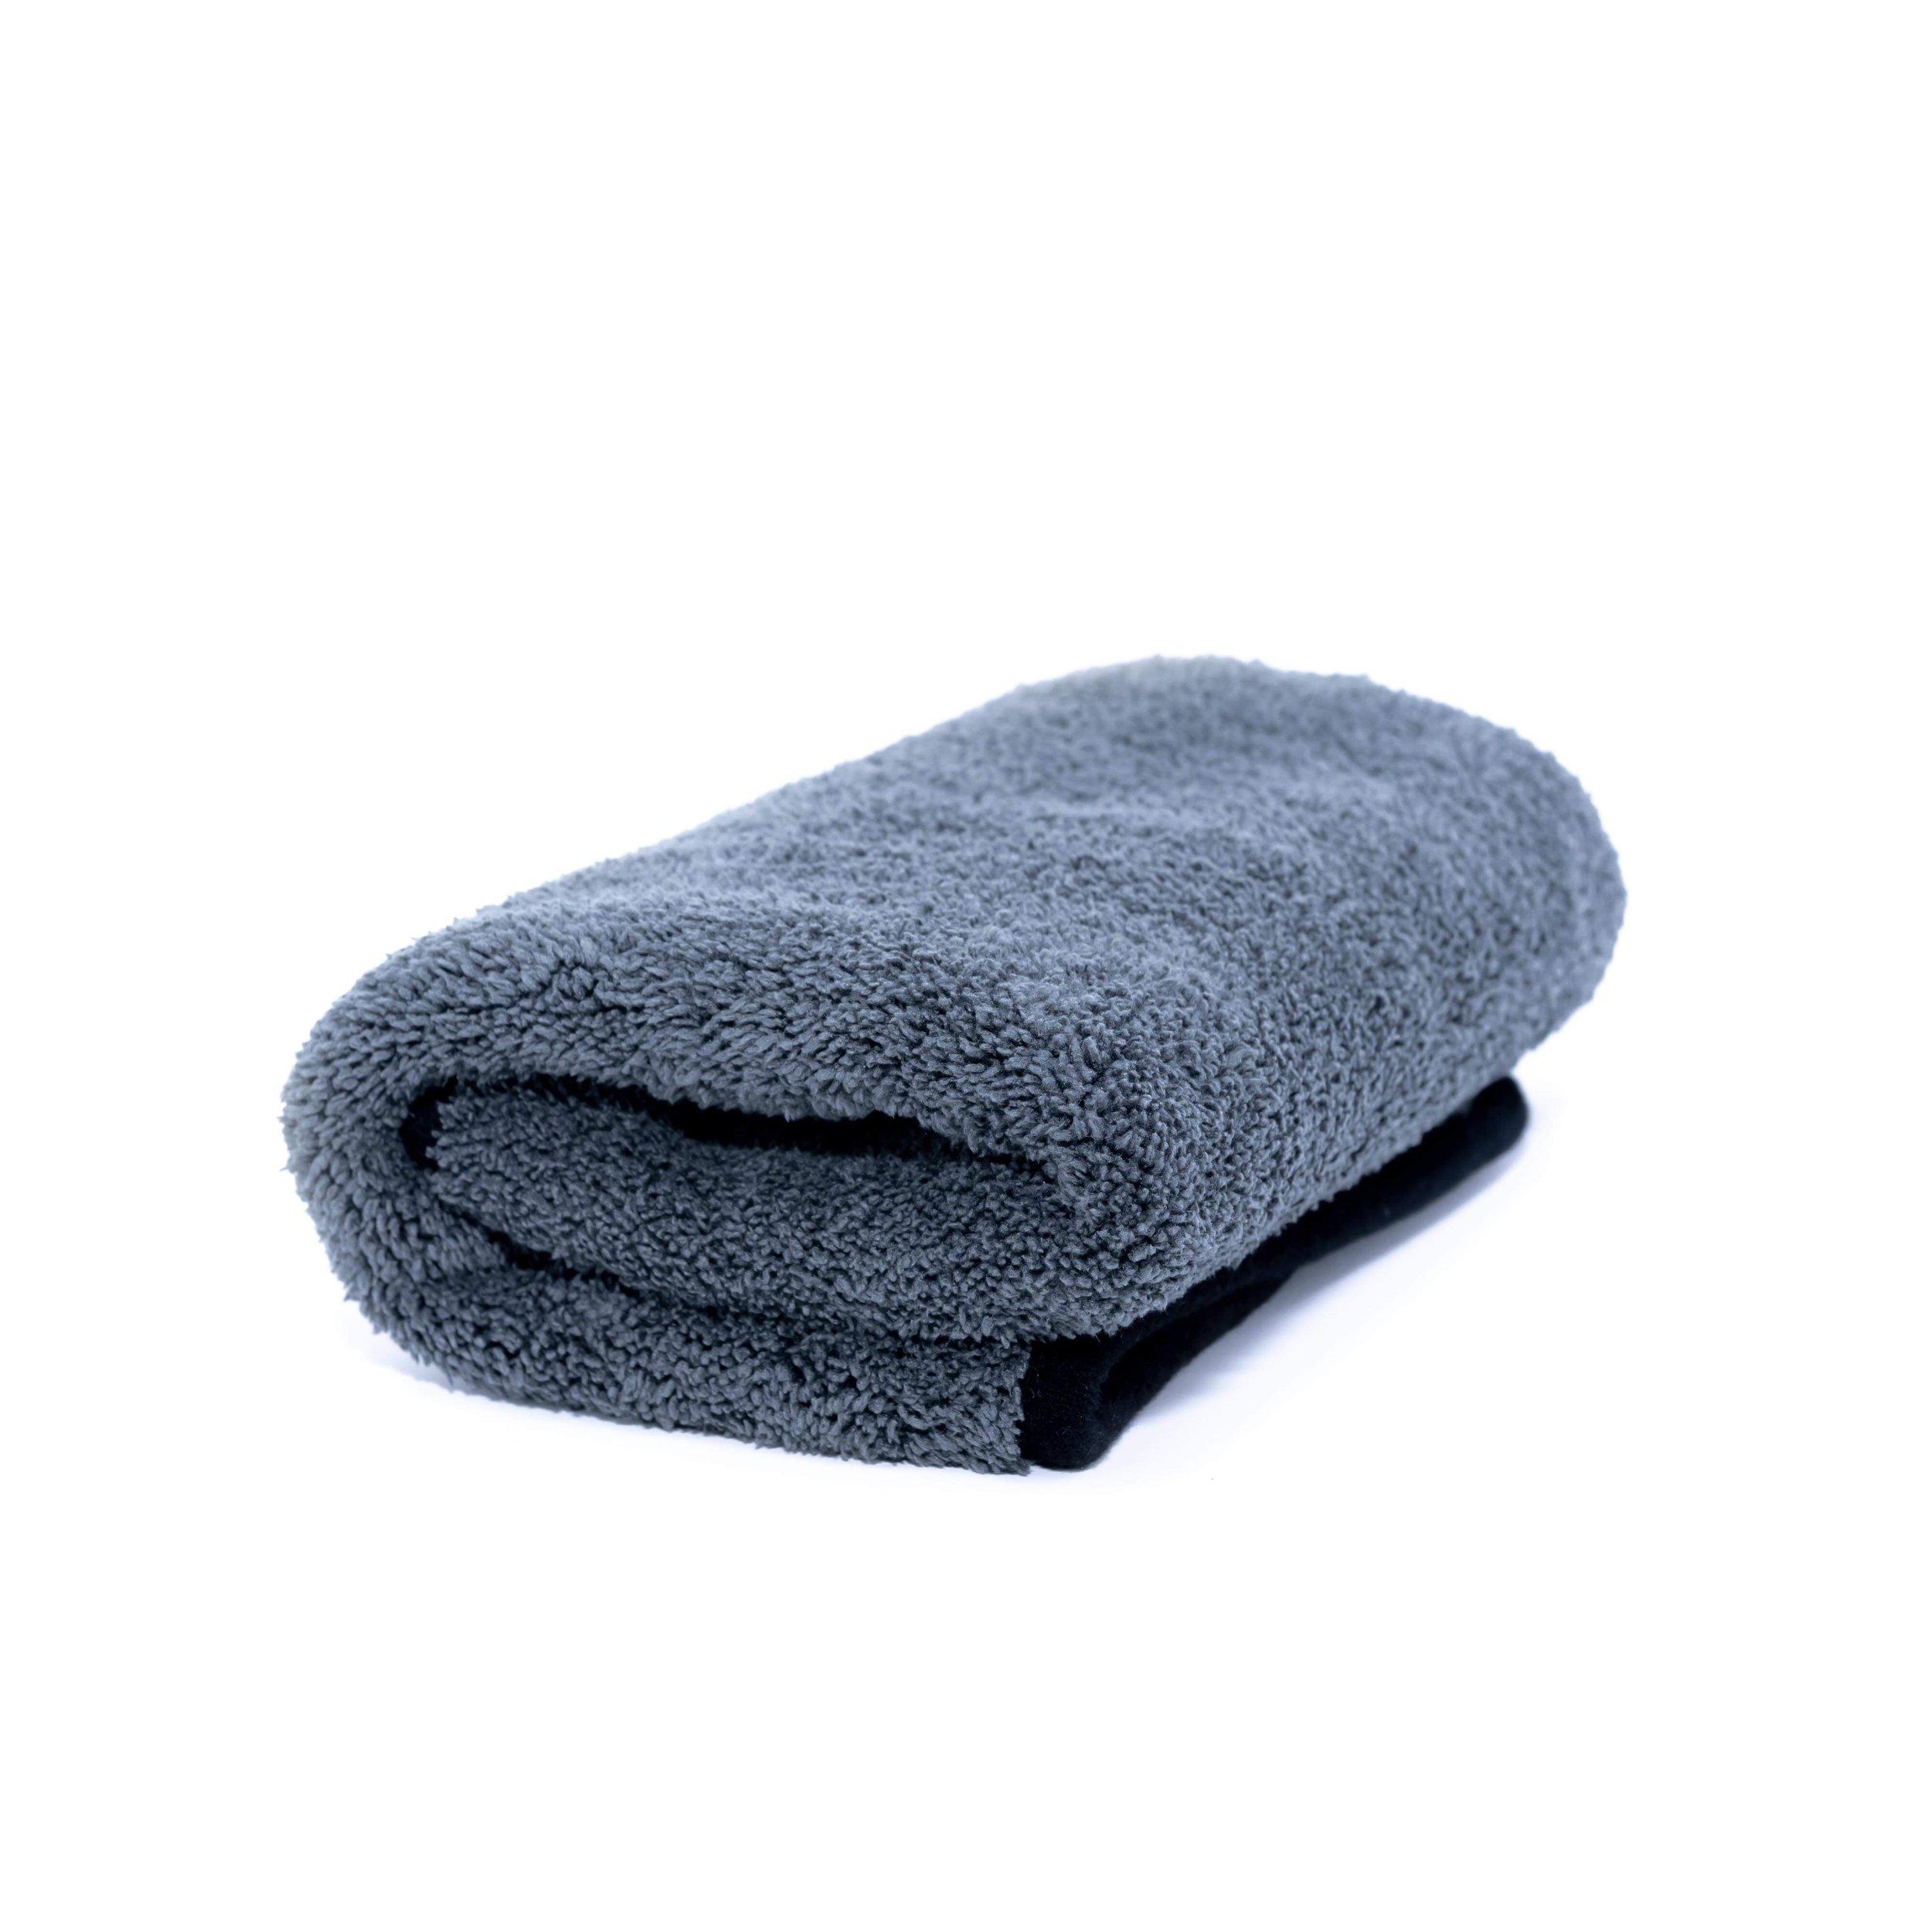 Vvash Auto Care 1000 GSM Microfiber Towel 16x16